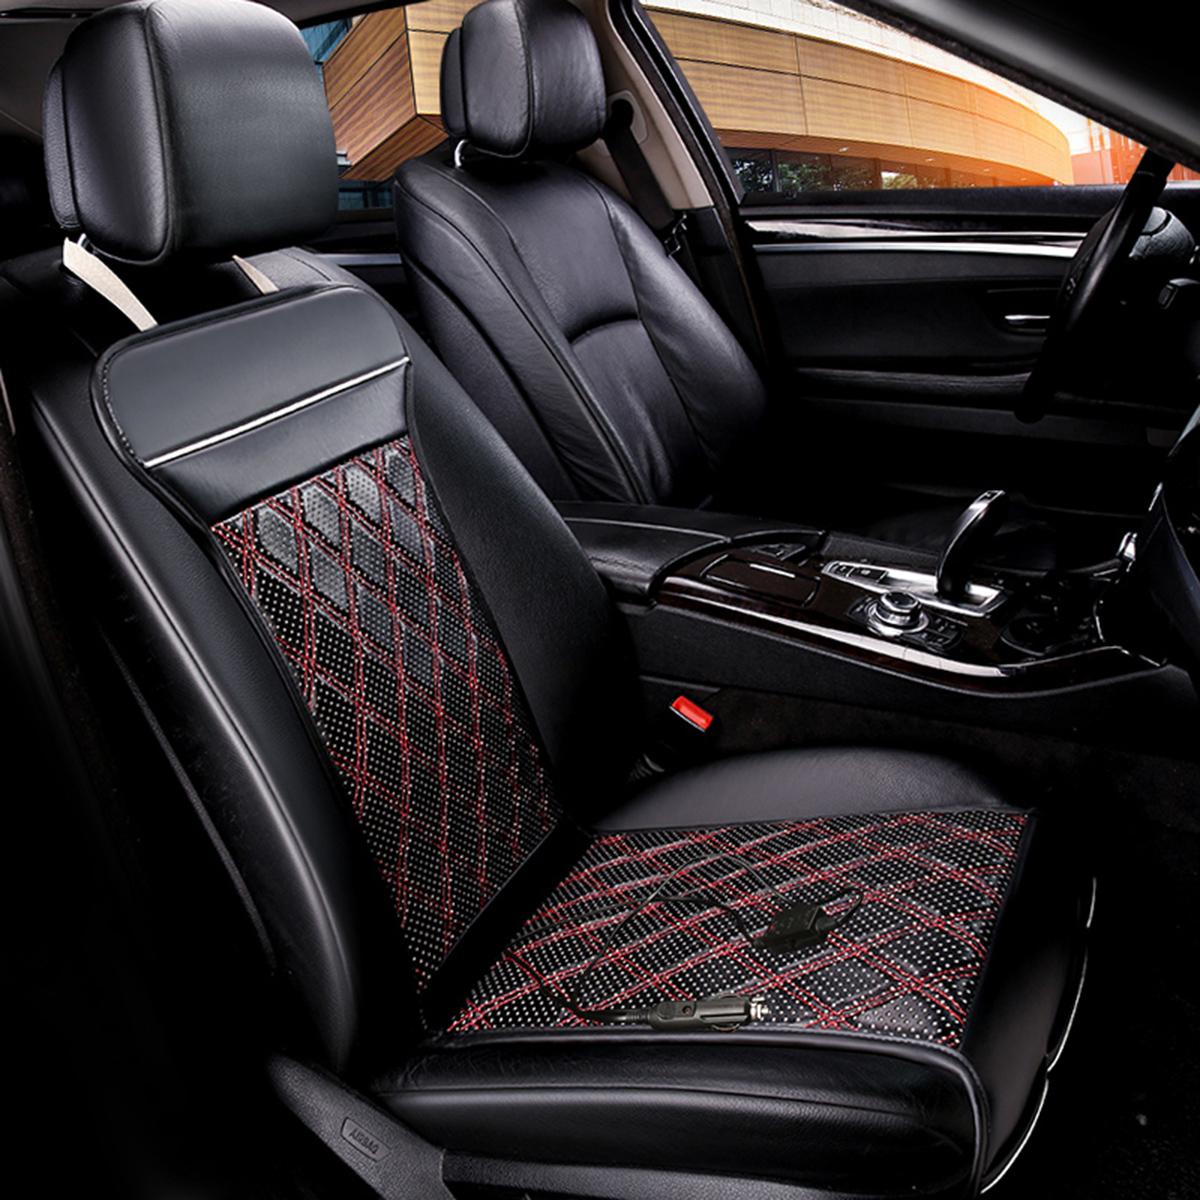 12v Car Heated Seat Cushion Warmer Winter Household Cover Electric Heating Mat Pad 5a8a7163 1d51 44d4 9fe2 7d2269aaff59 Jpg